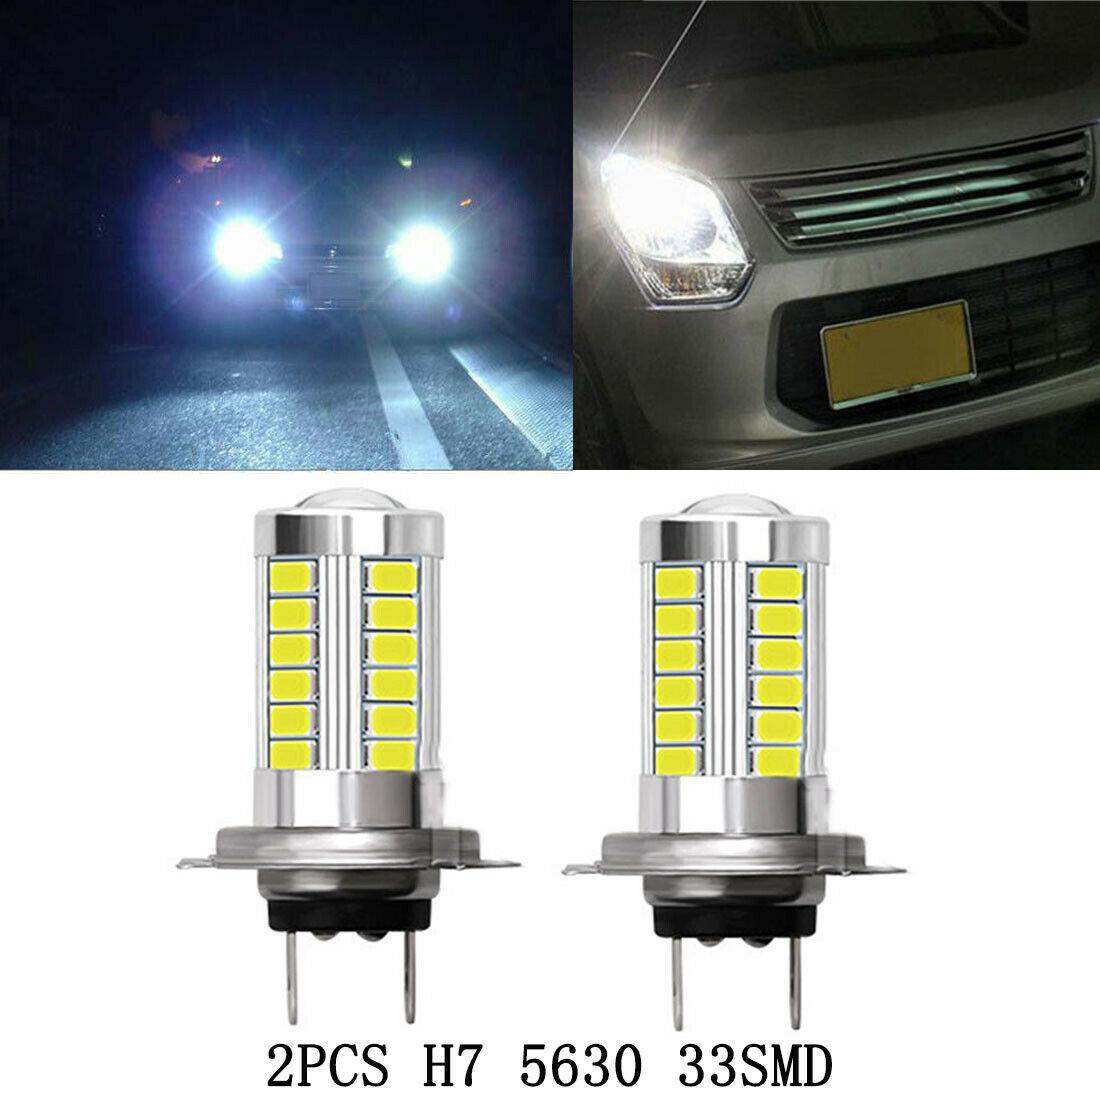 10pcs 무료 배송 H7 5630 LED 33 SMD LED 12V 6000K 화이트 자동 자동차 안개 빛 헤드 라이트 전구 밝은